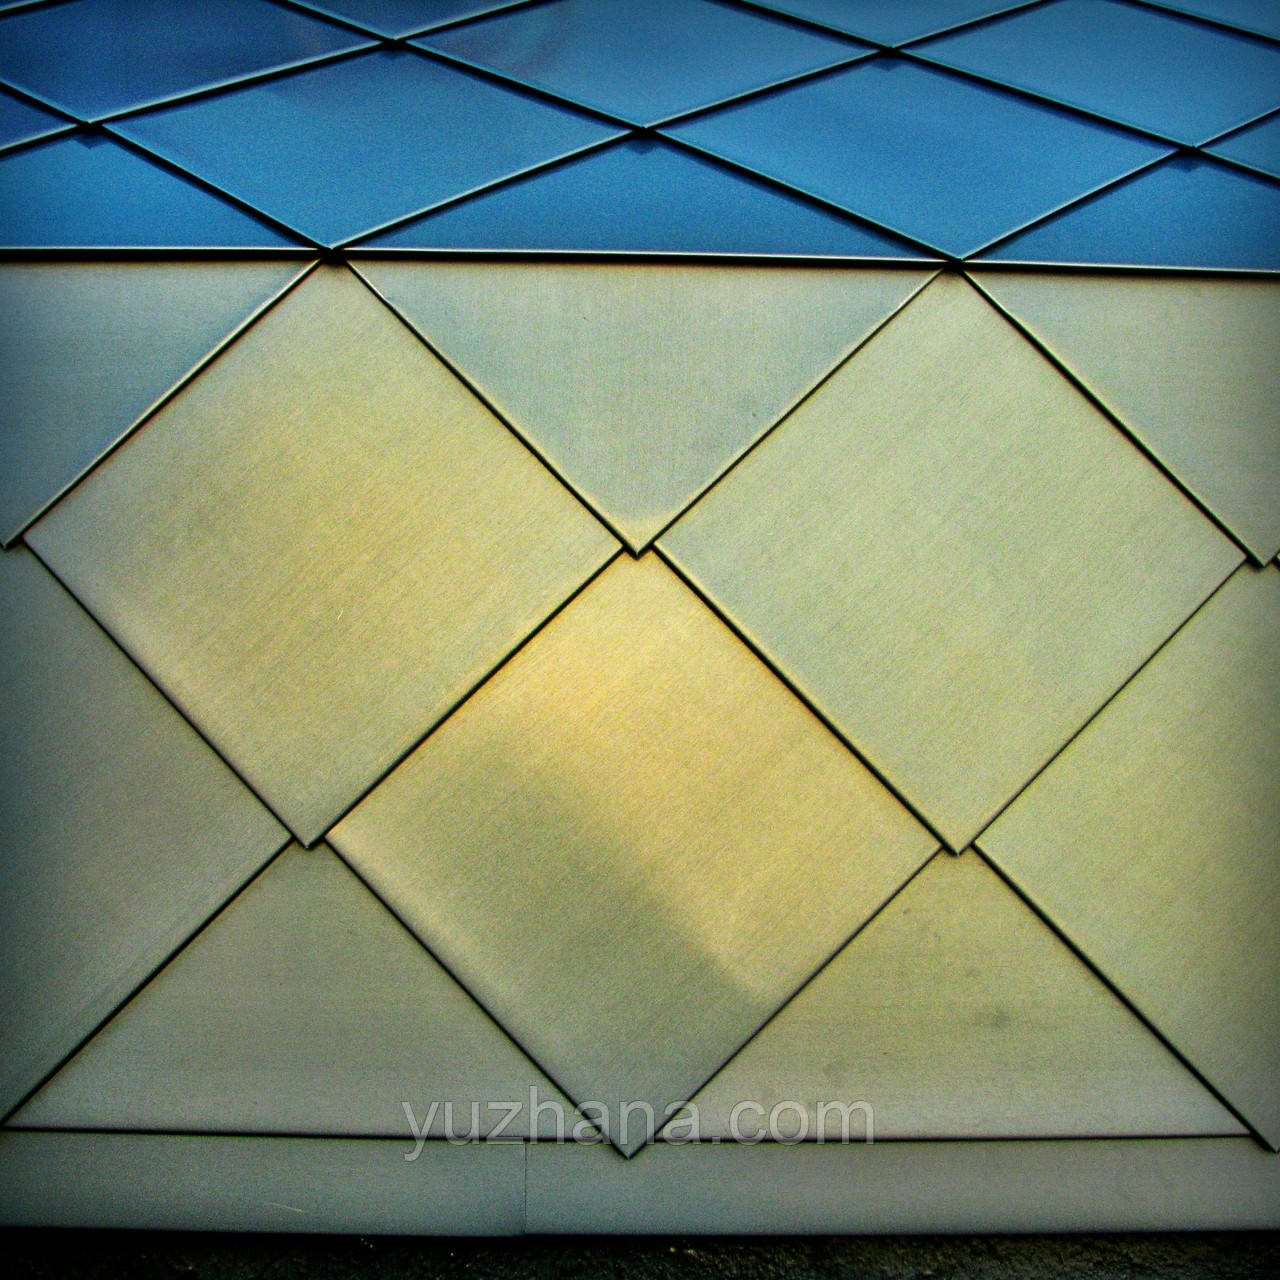 Шашка плоская из цинк-титана Цинк-титановые ромбы Шашки кровельная Монтаж даху з пласкіх ромбів